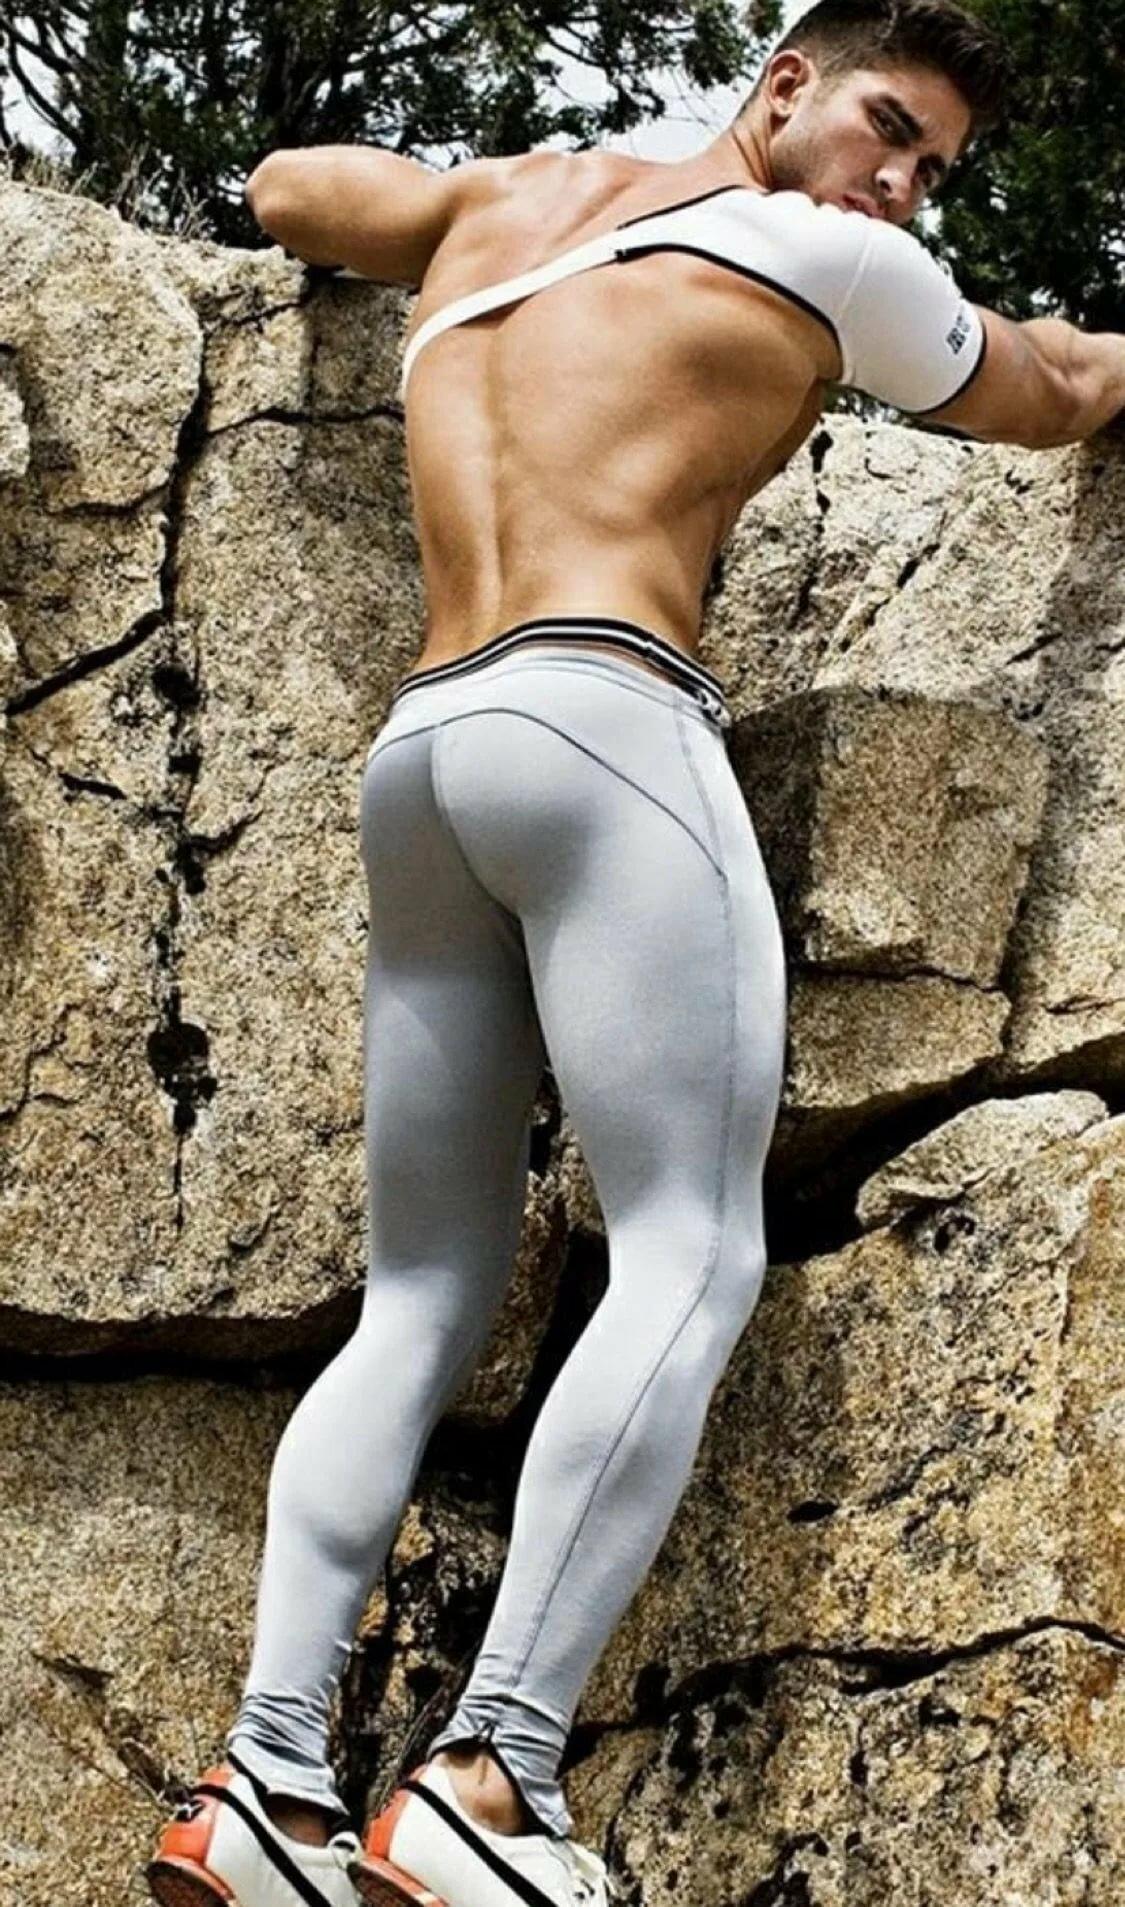 Ass gay in man pants tight tight